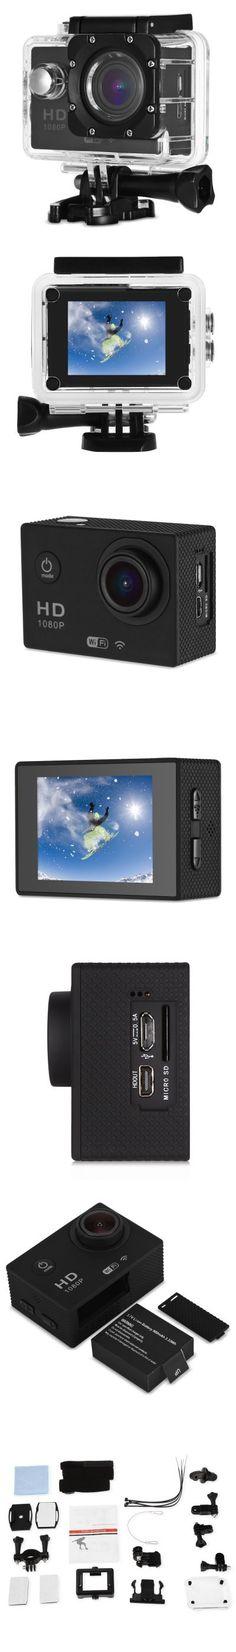 CS5000H WiFi Action Camera Full HD 1080P EU PLUG-35.34